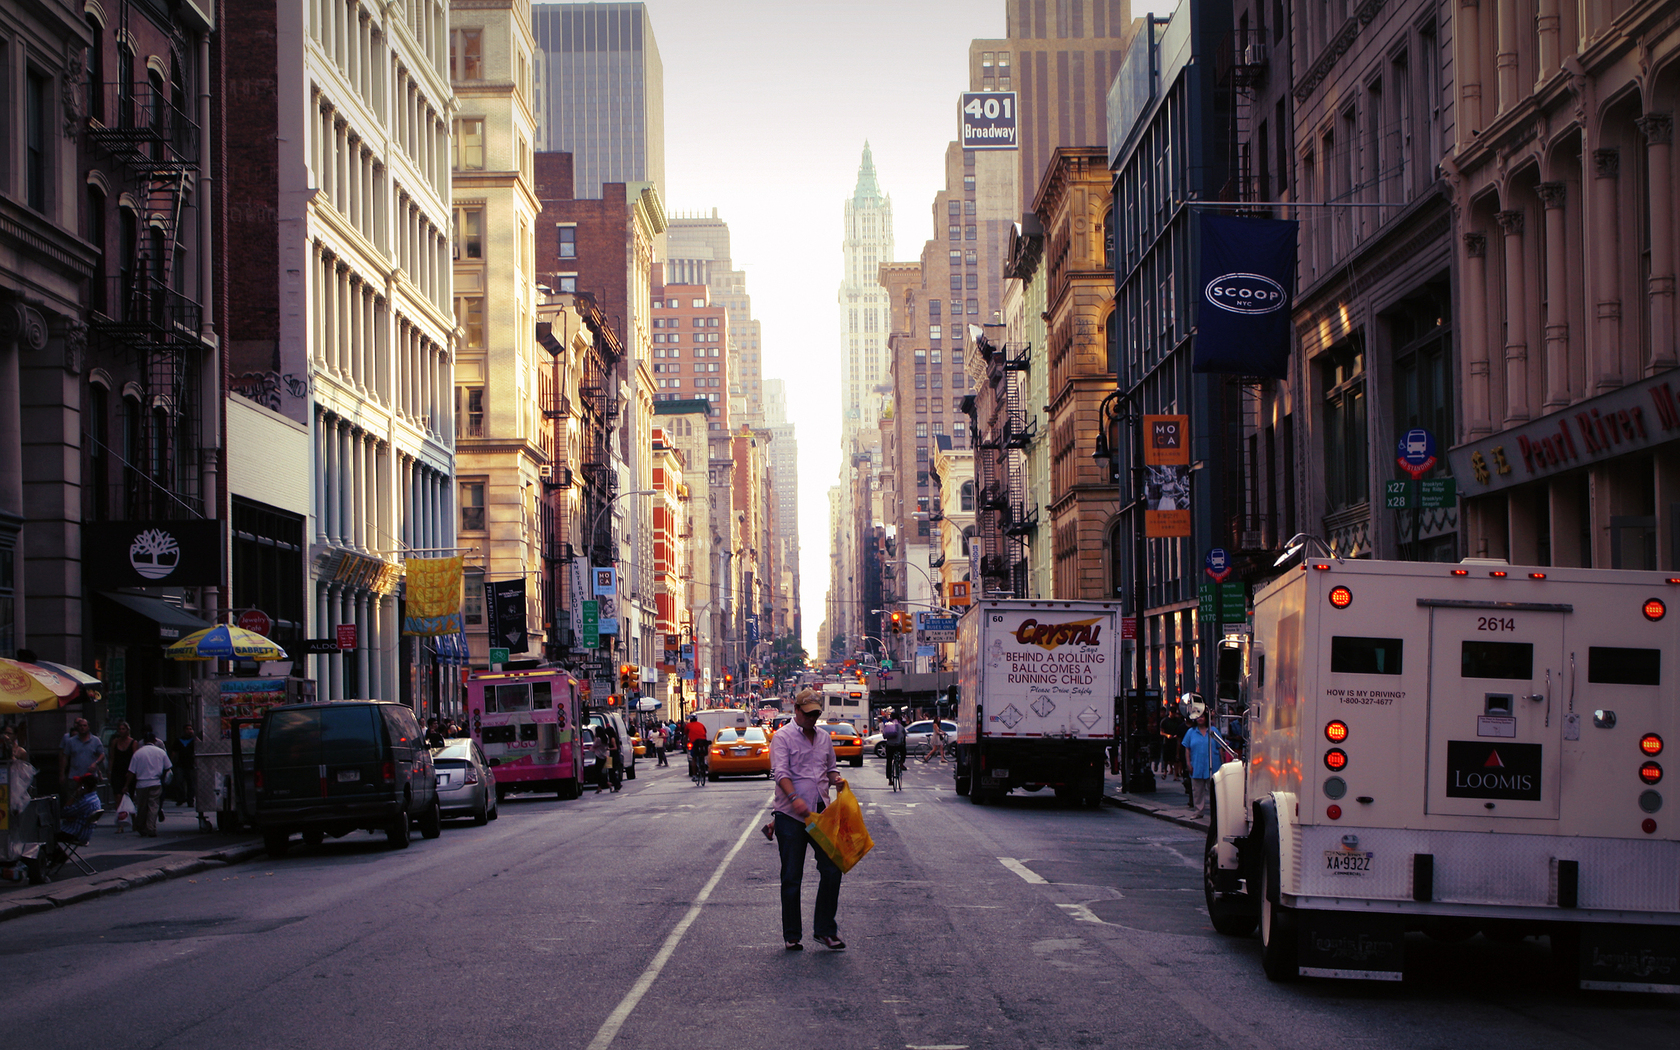 new york city street wallpapers - 1680x1050